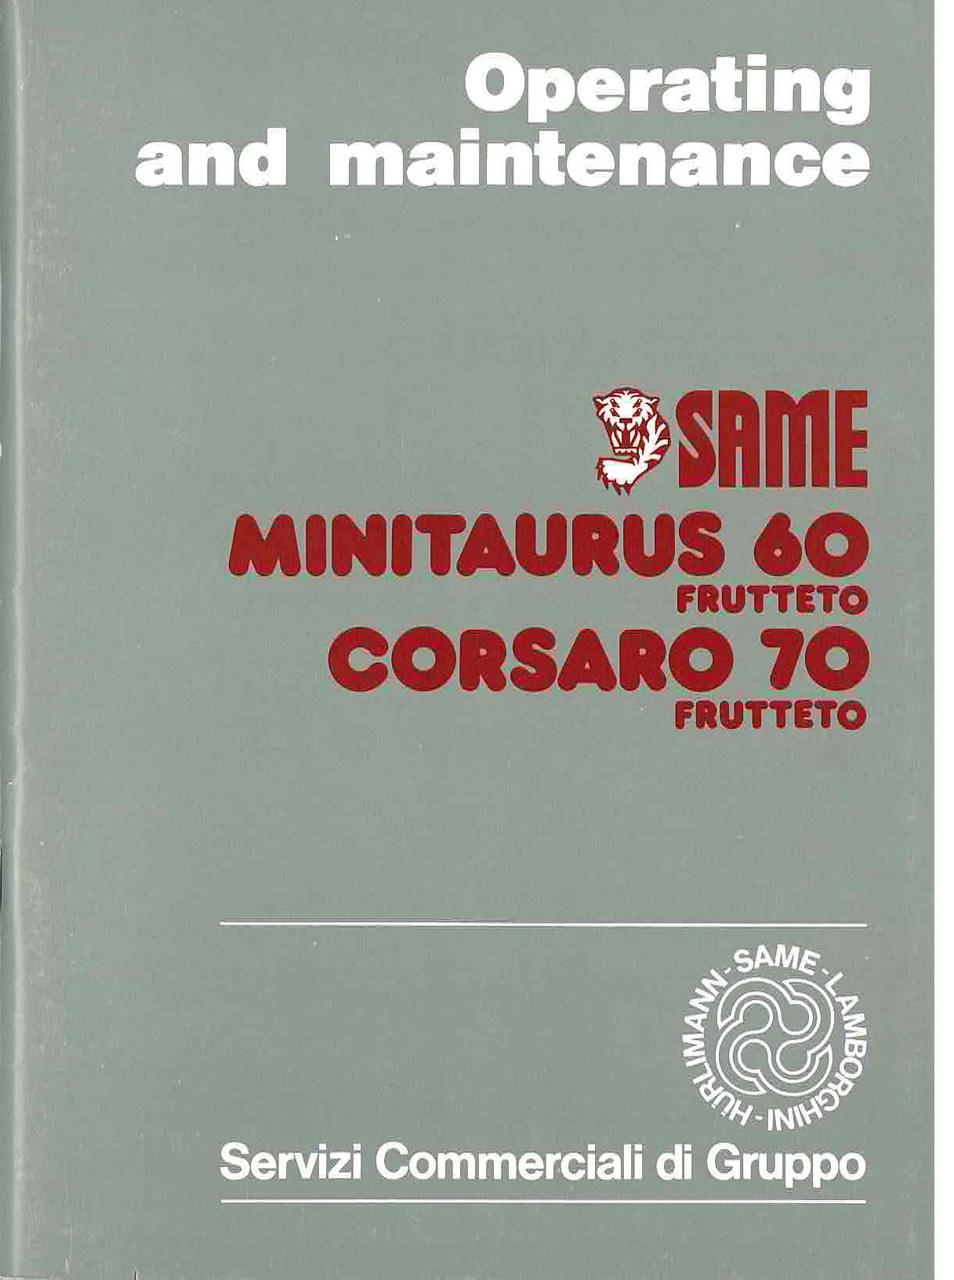 MINITAURUS 60 FRUTTETO - CORSARO 70 FRUTTETO - Operating and maintenance